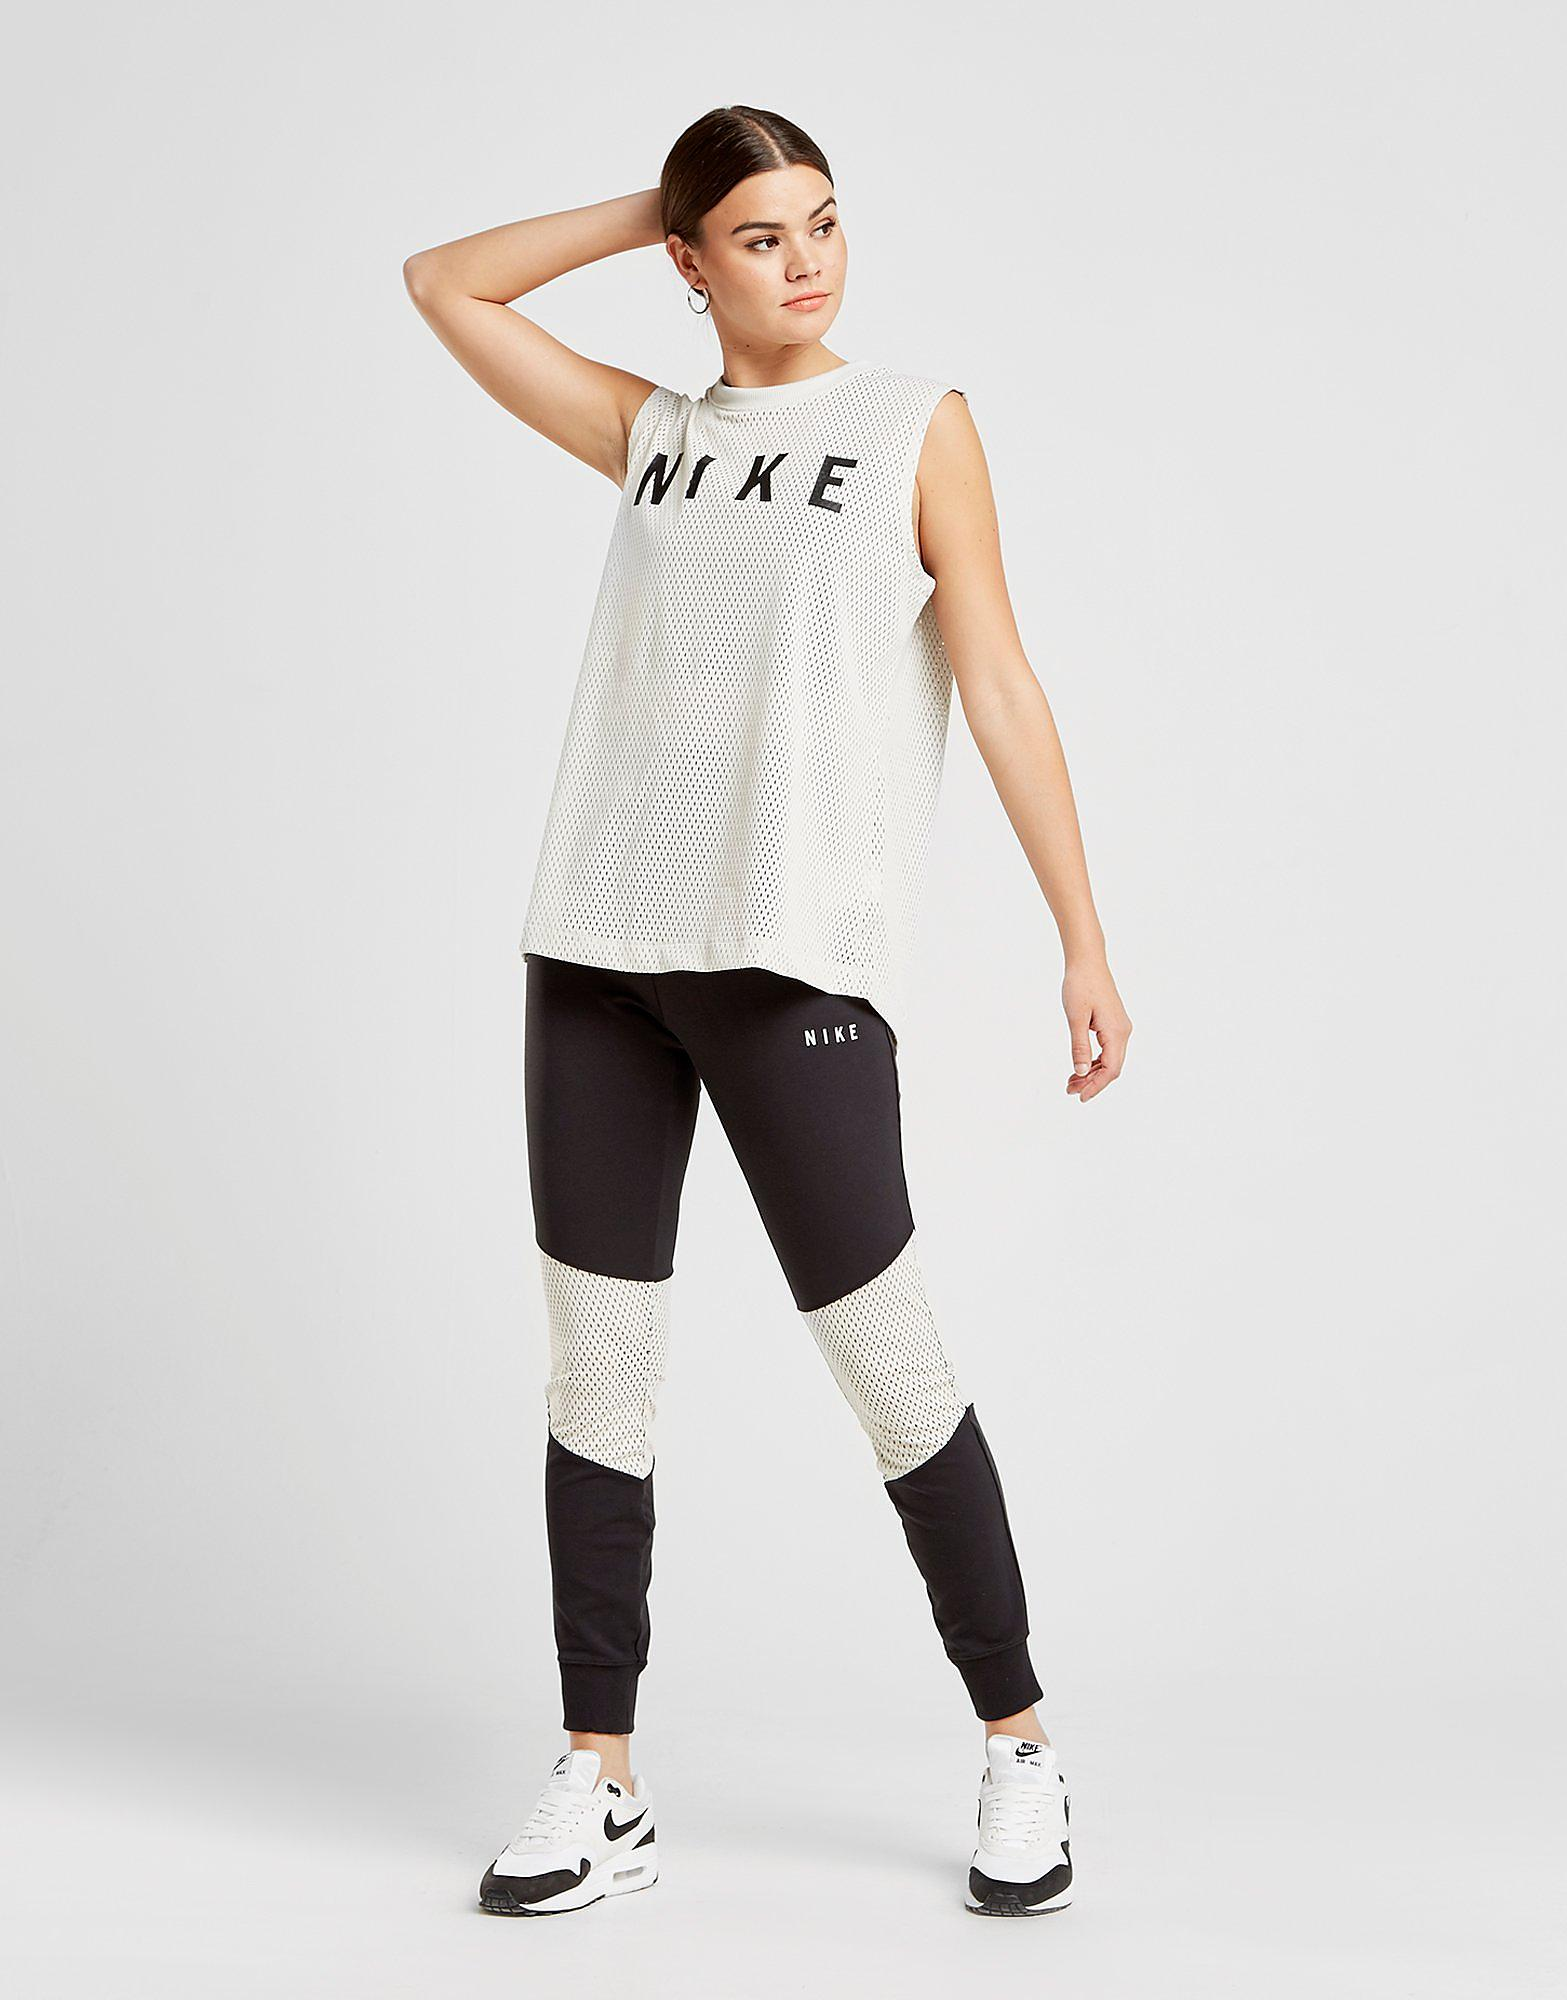 Nike Mesh Muscle Tank Top